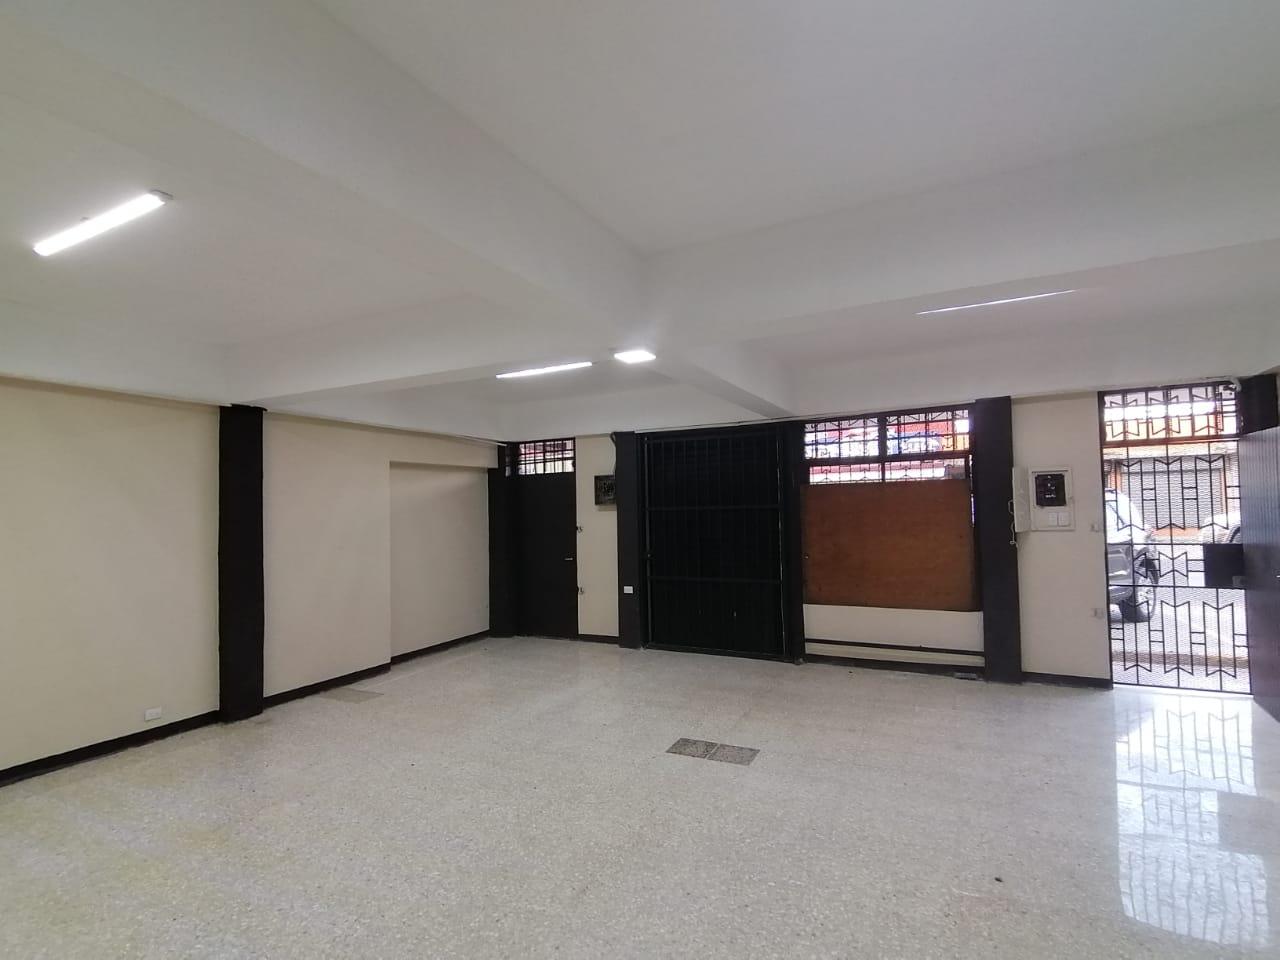 2855 Se alquila local comercial sobre calle principal en Sagrada Familia